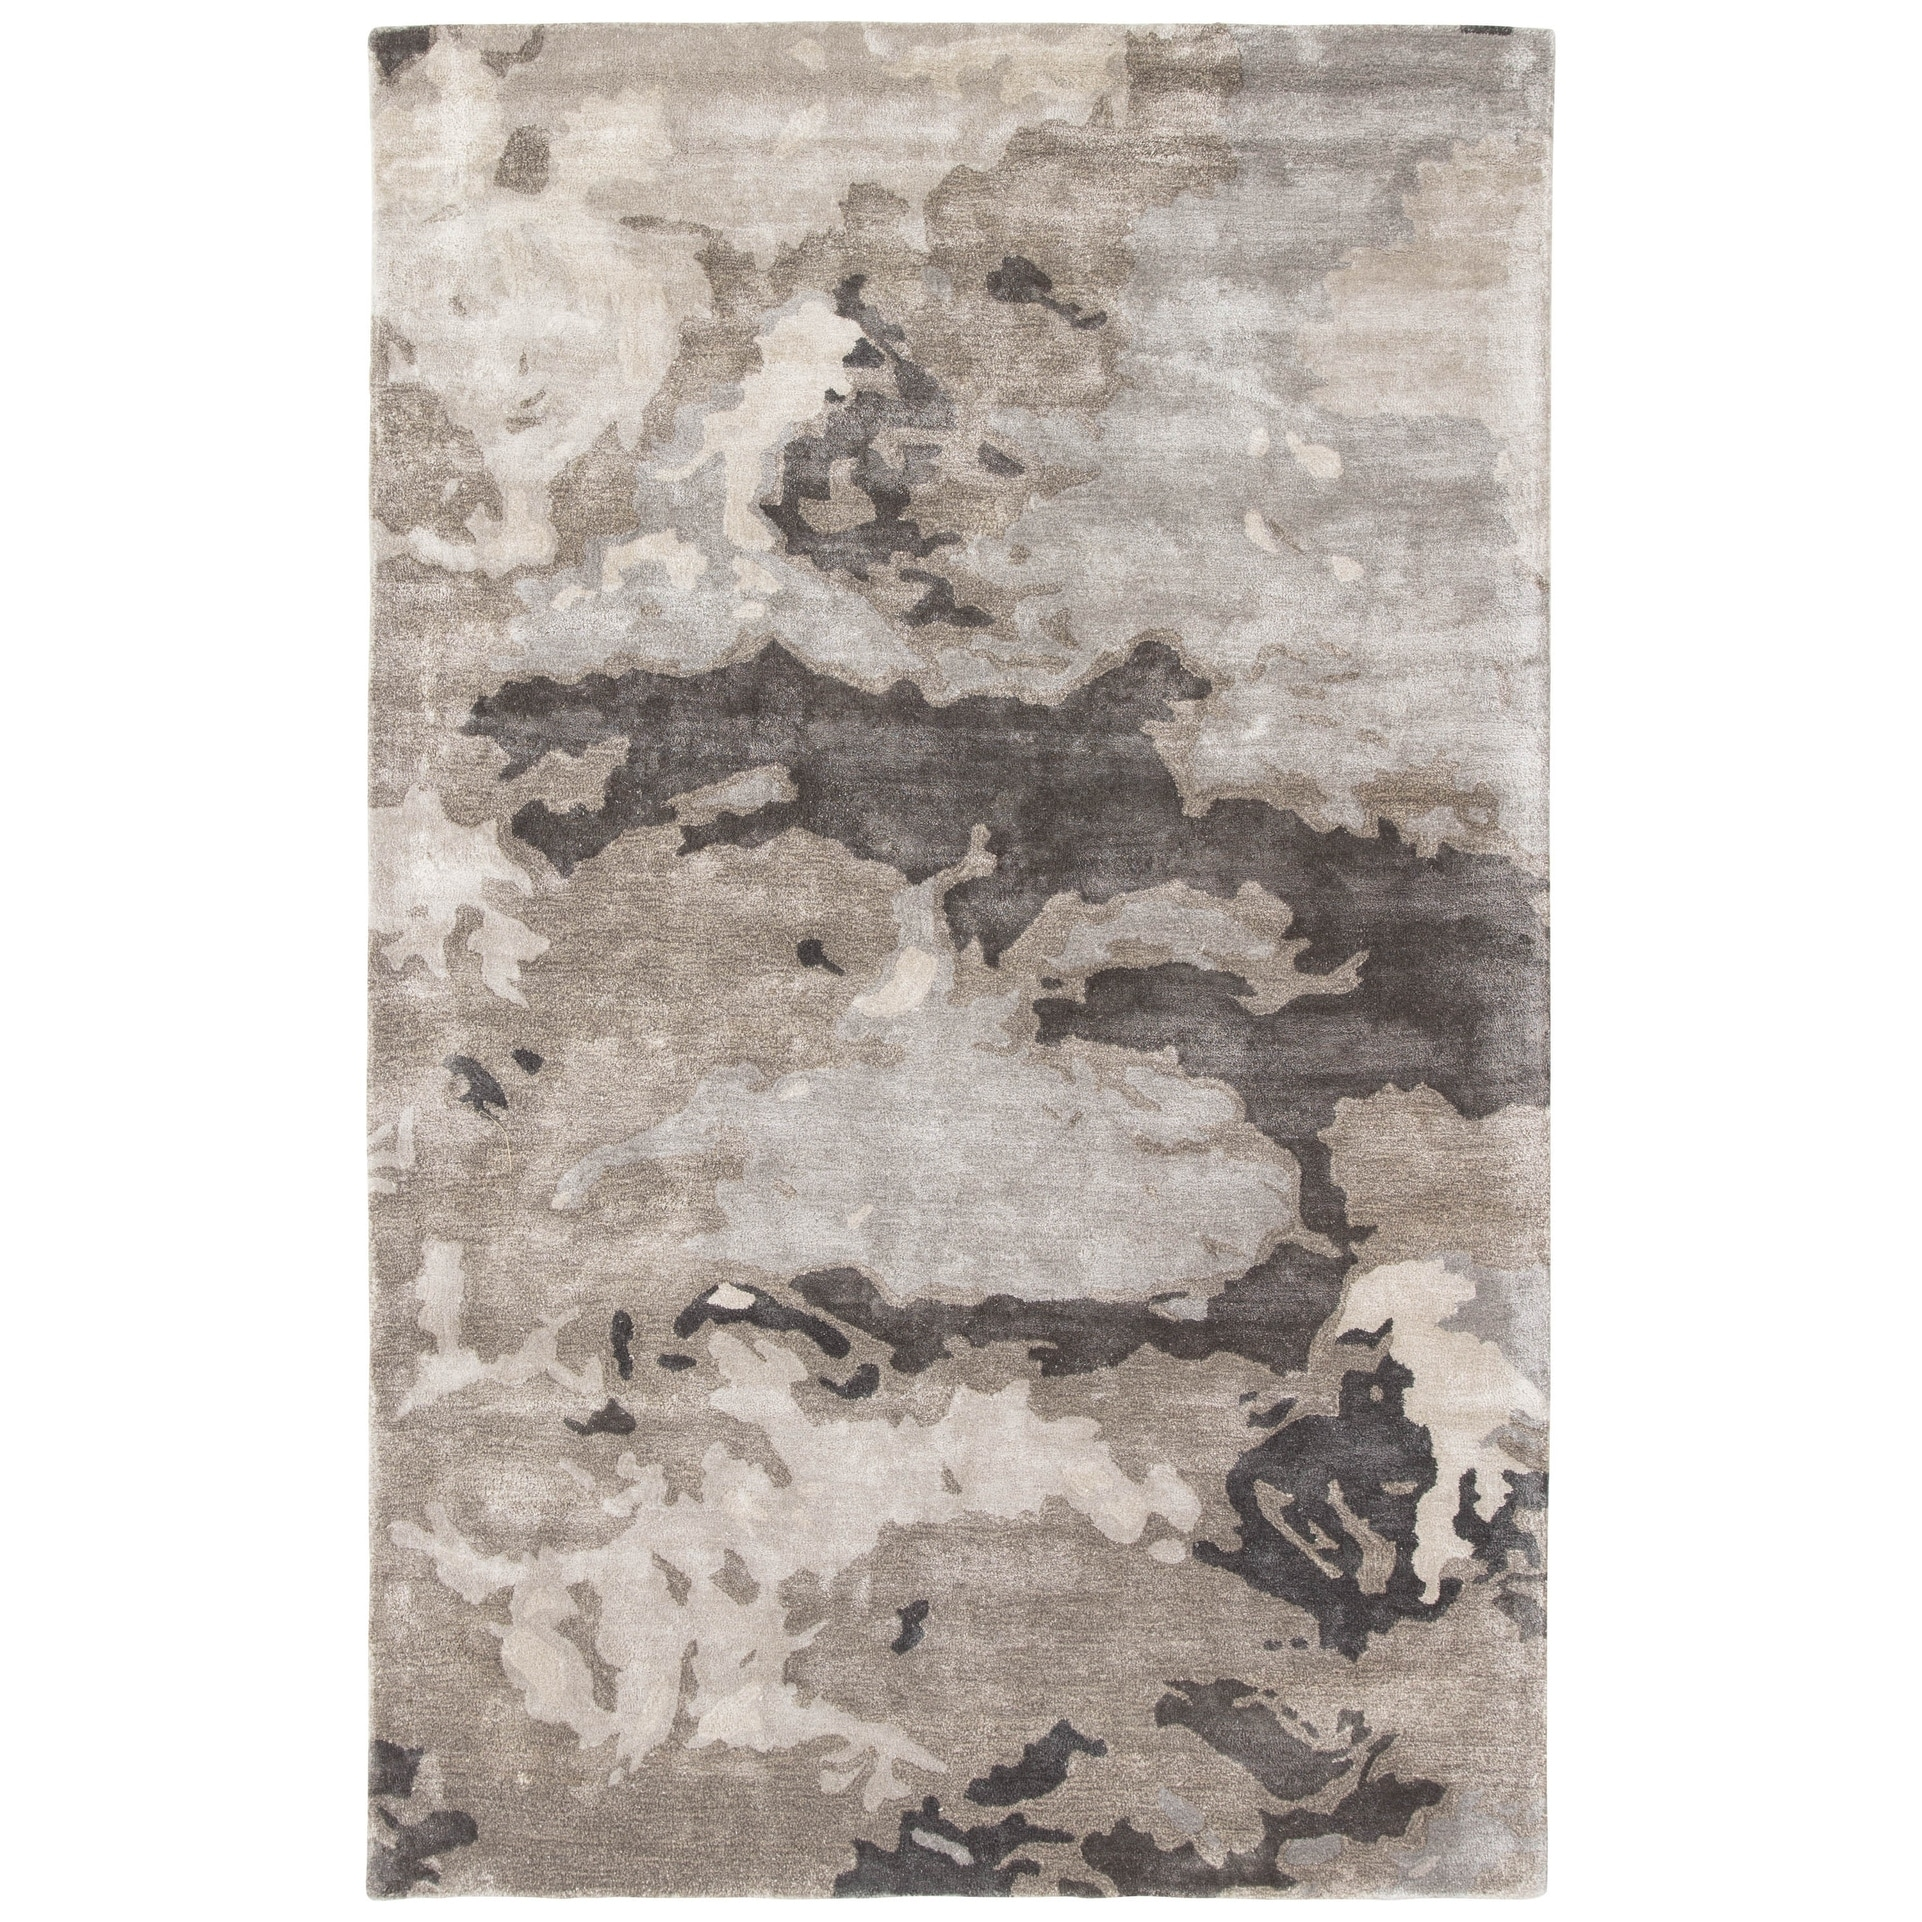 Mudra Handmade Abstract Grey Silver Area Rug Overstock 11110740